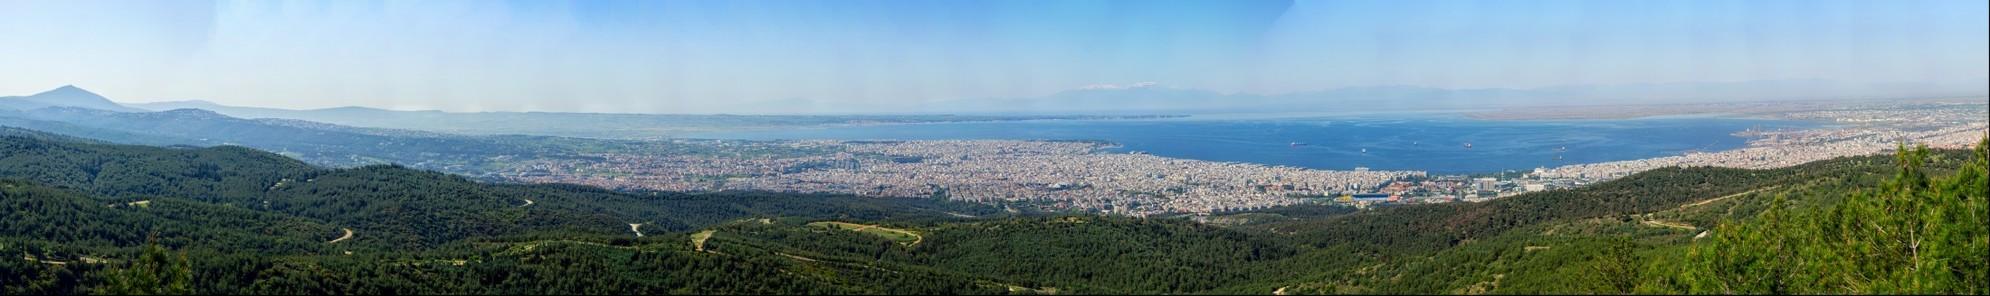 View from Seih-Sou Thessaloniki